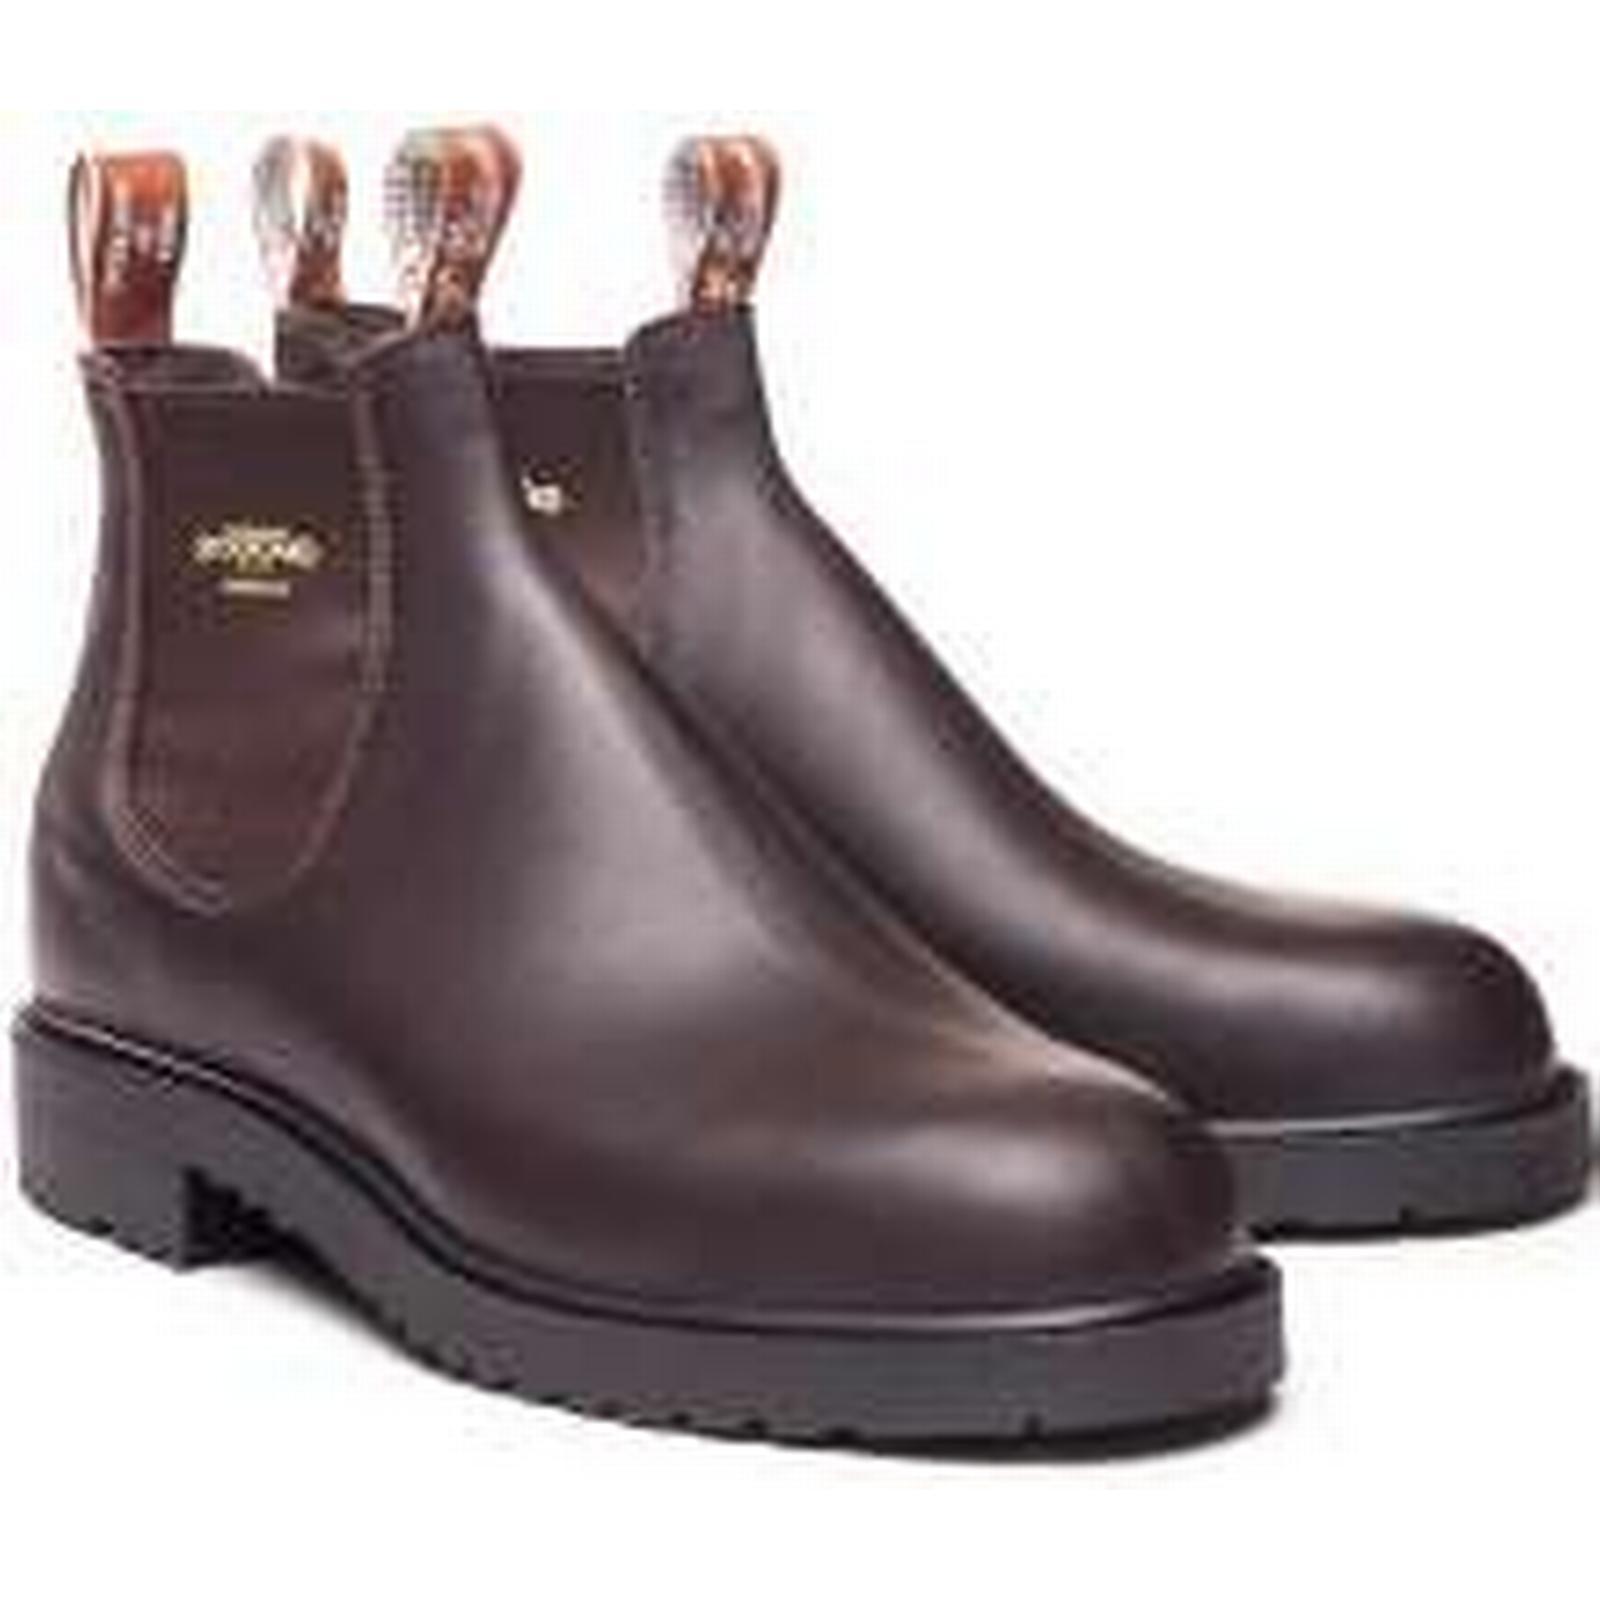 R.M. UK Williams Stockyard Boots, Brown, UK R.M. 11.5 32cfbe